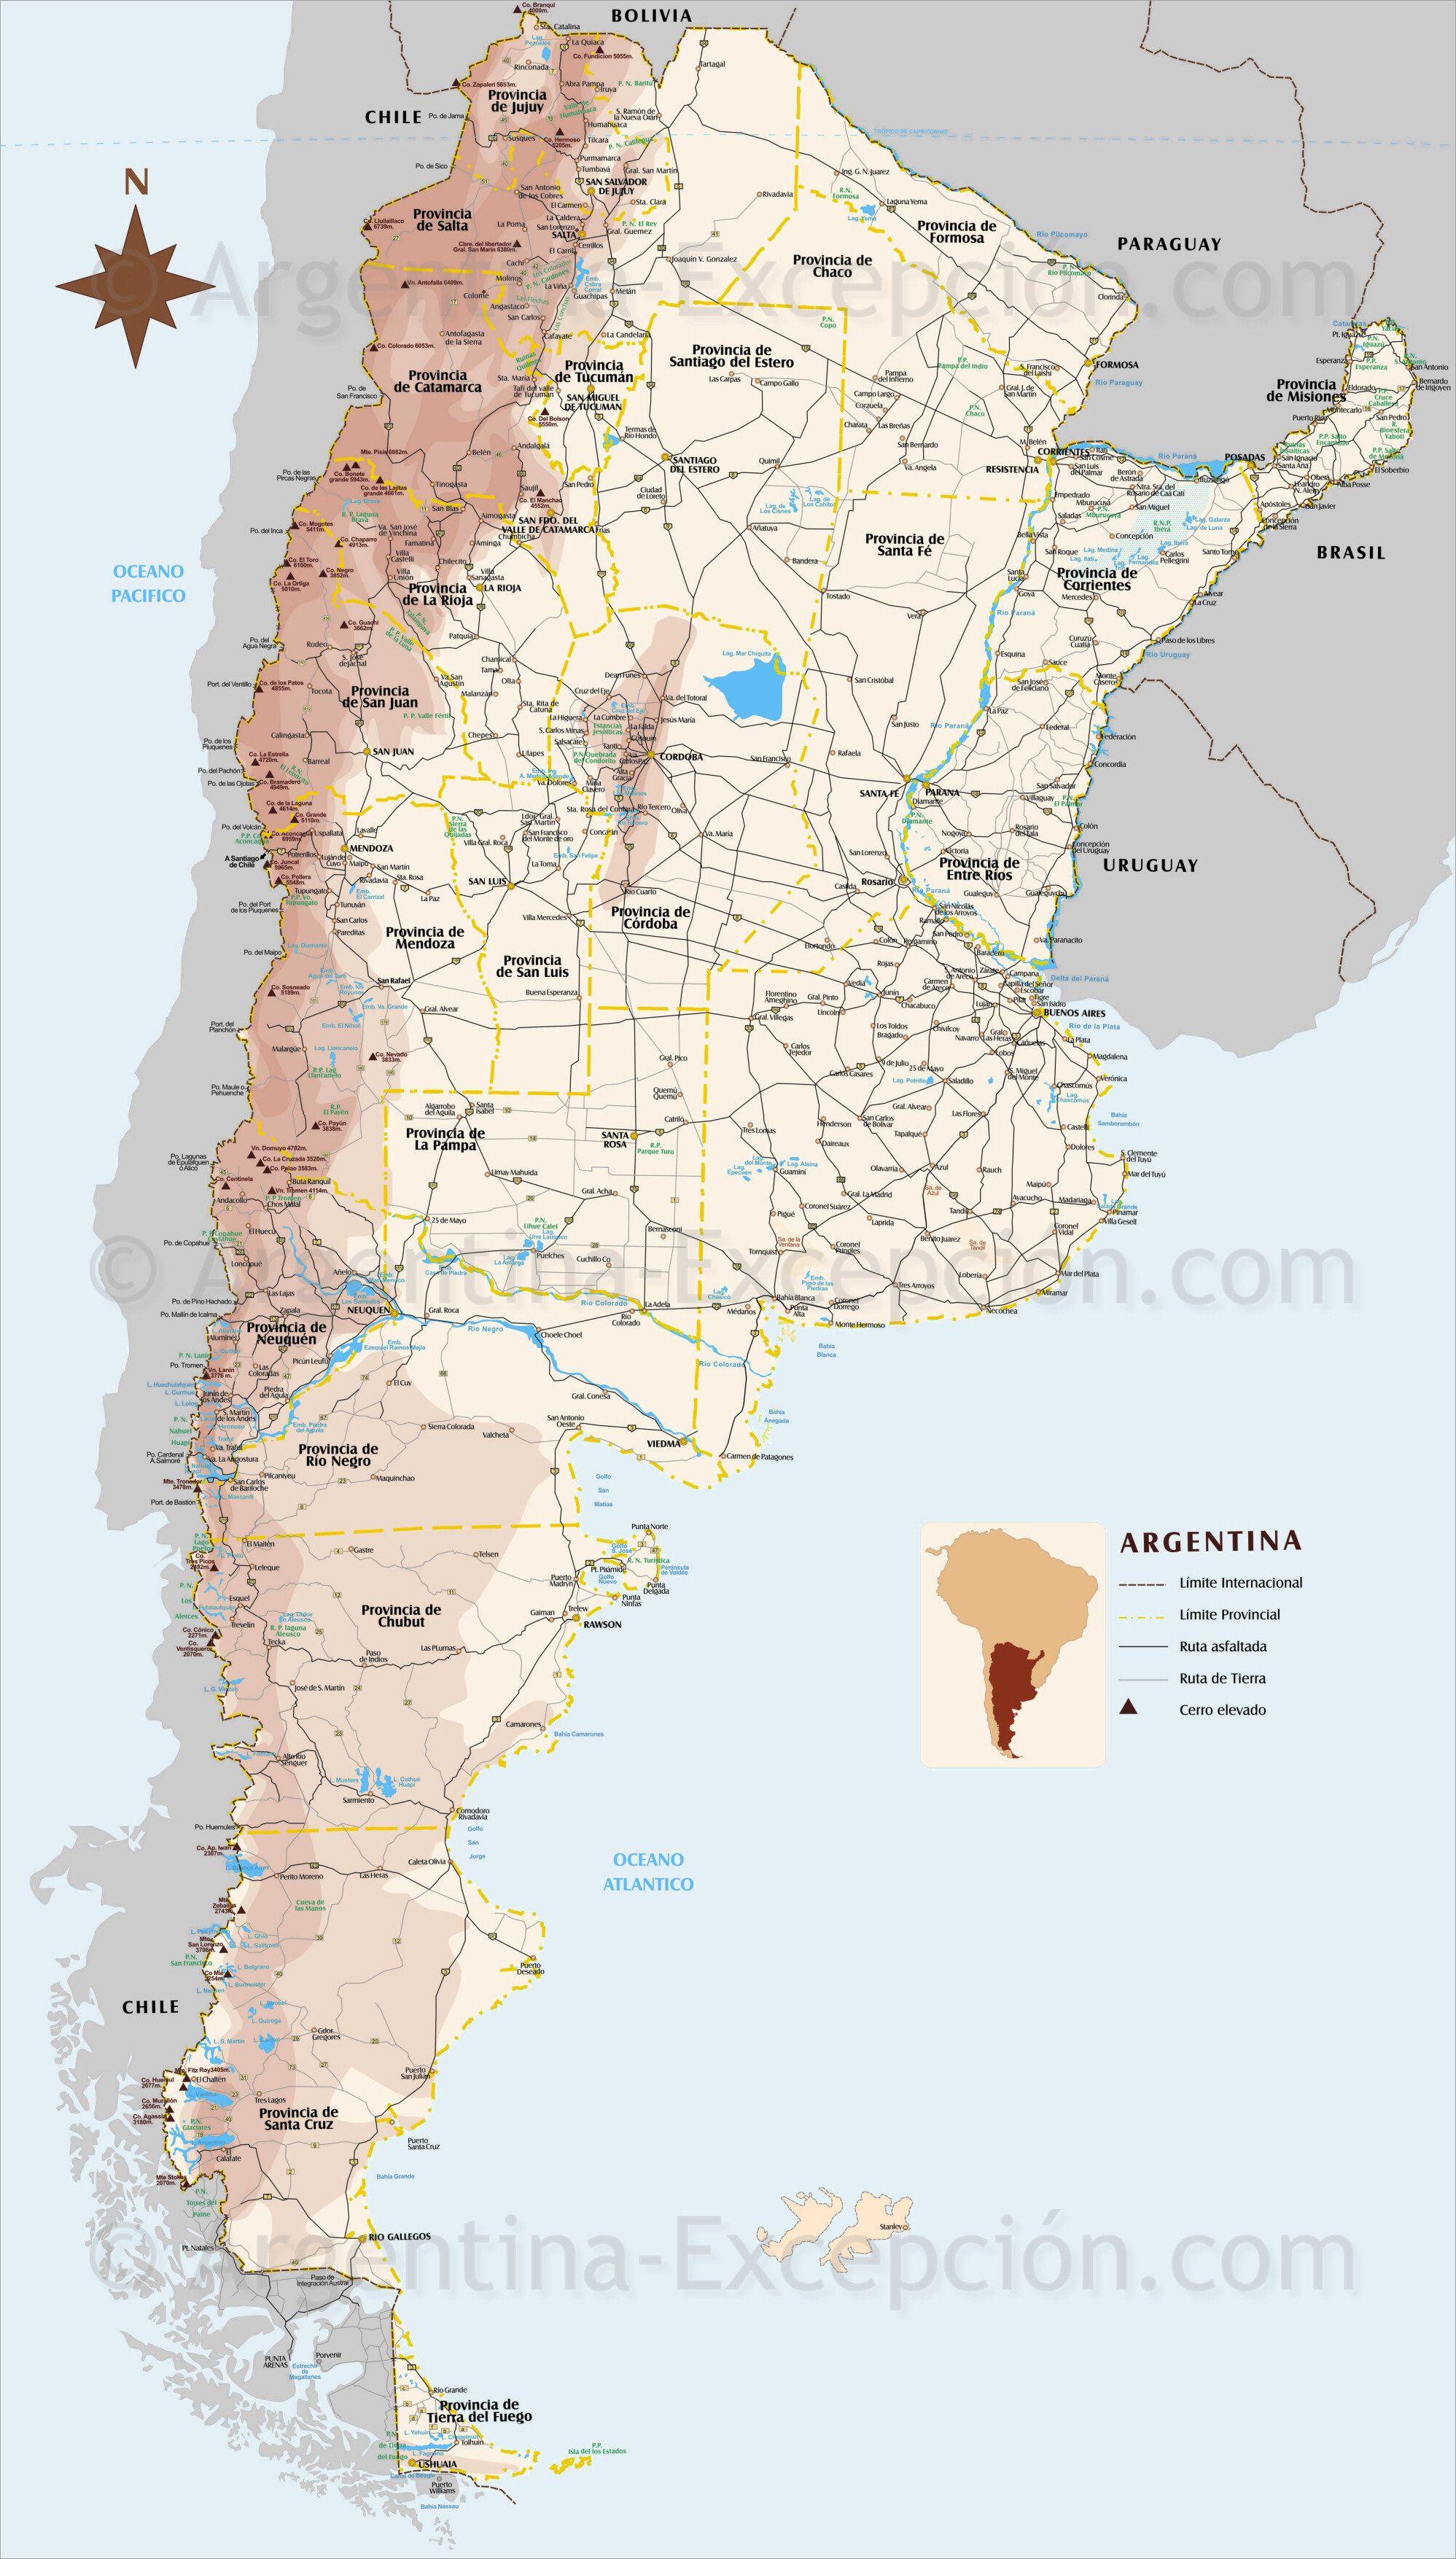 map of argentina_high resolution Argentine, Carte, Carte